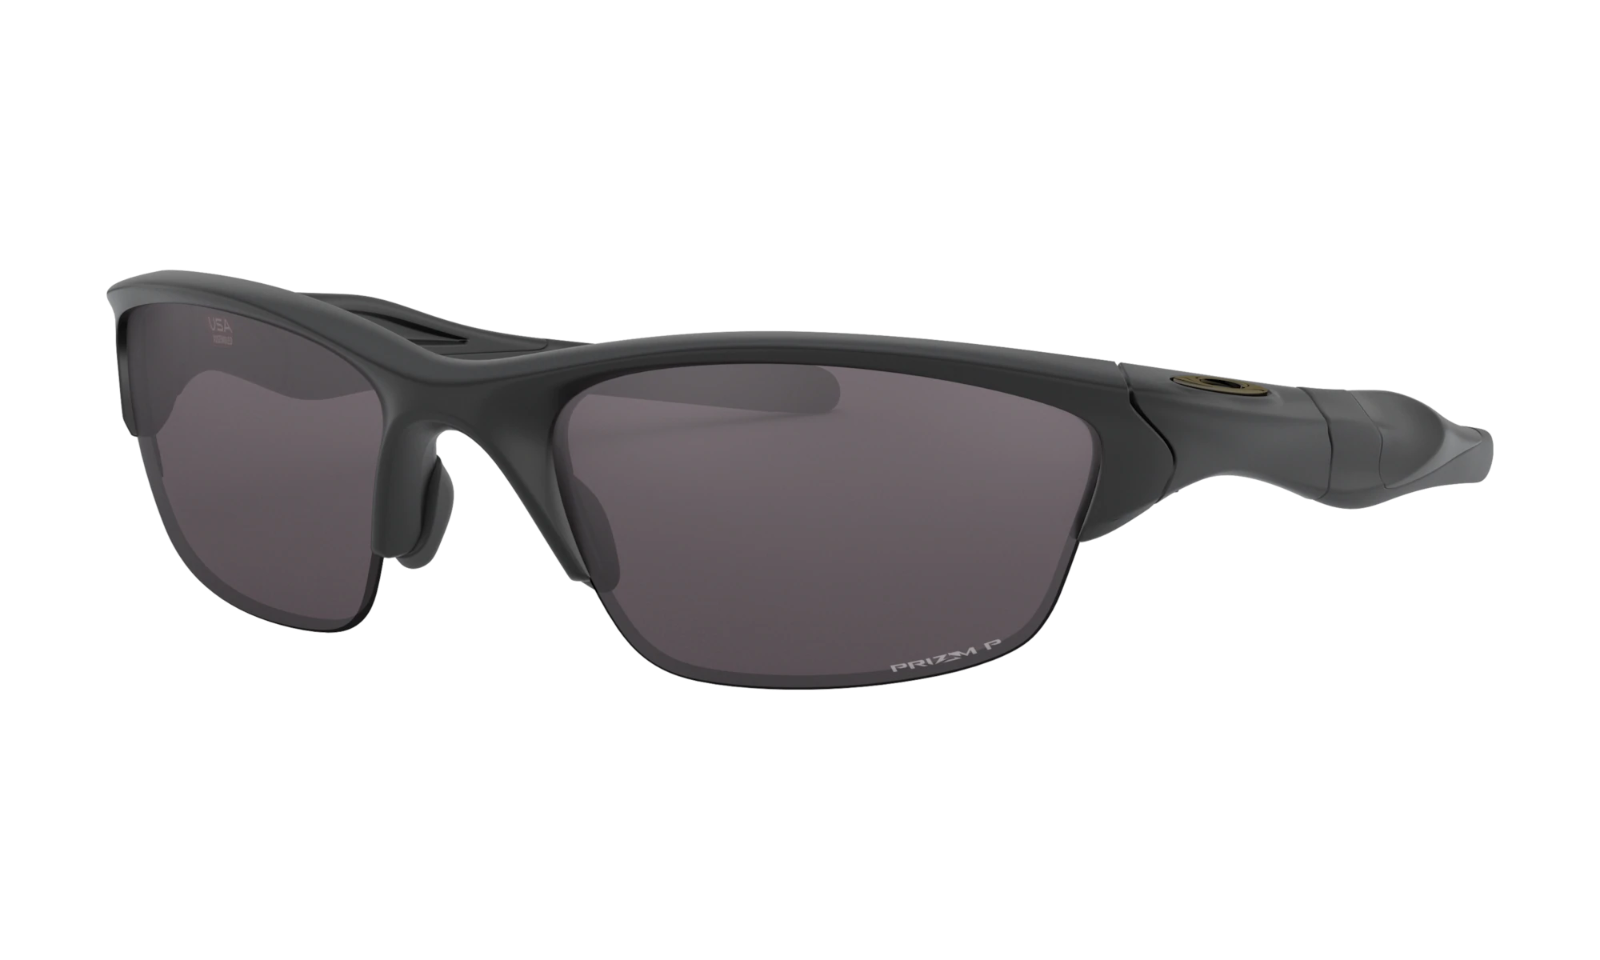 oakley-half-jacket-2-0-polarized-sunglasses-oo9144-2362-matte-black-w-prizm-grey